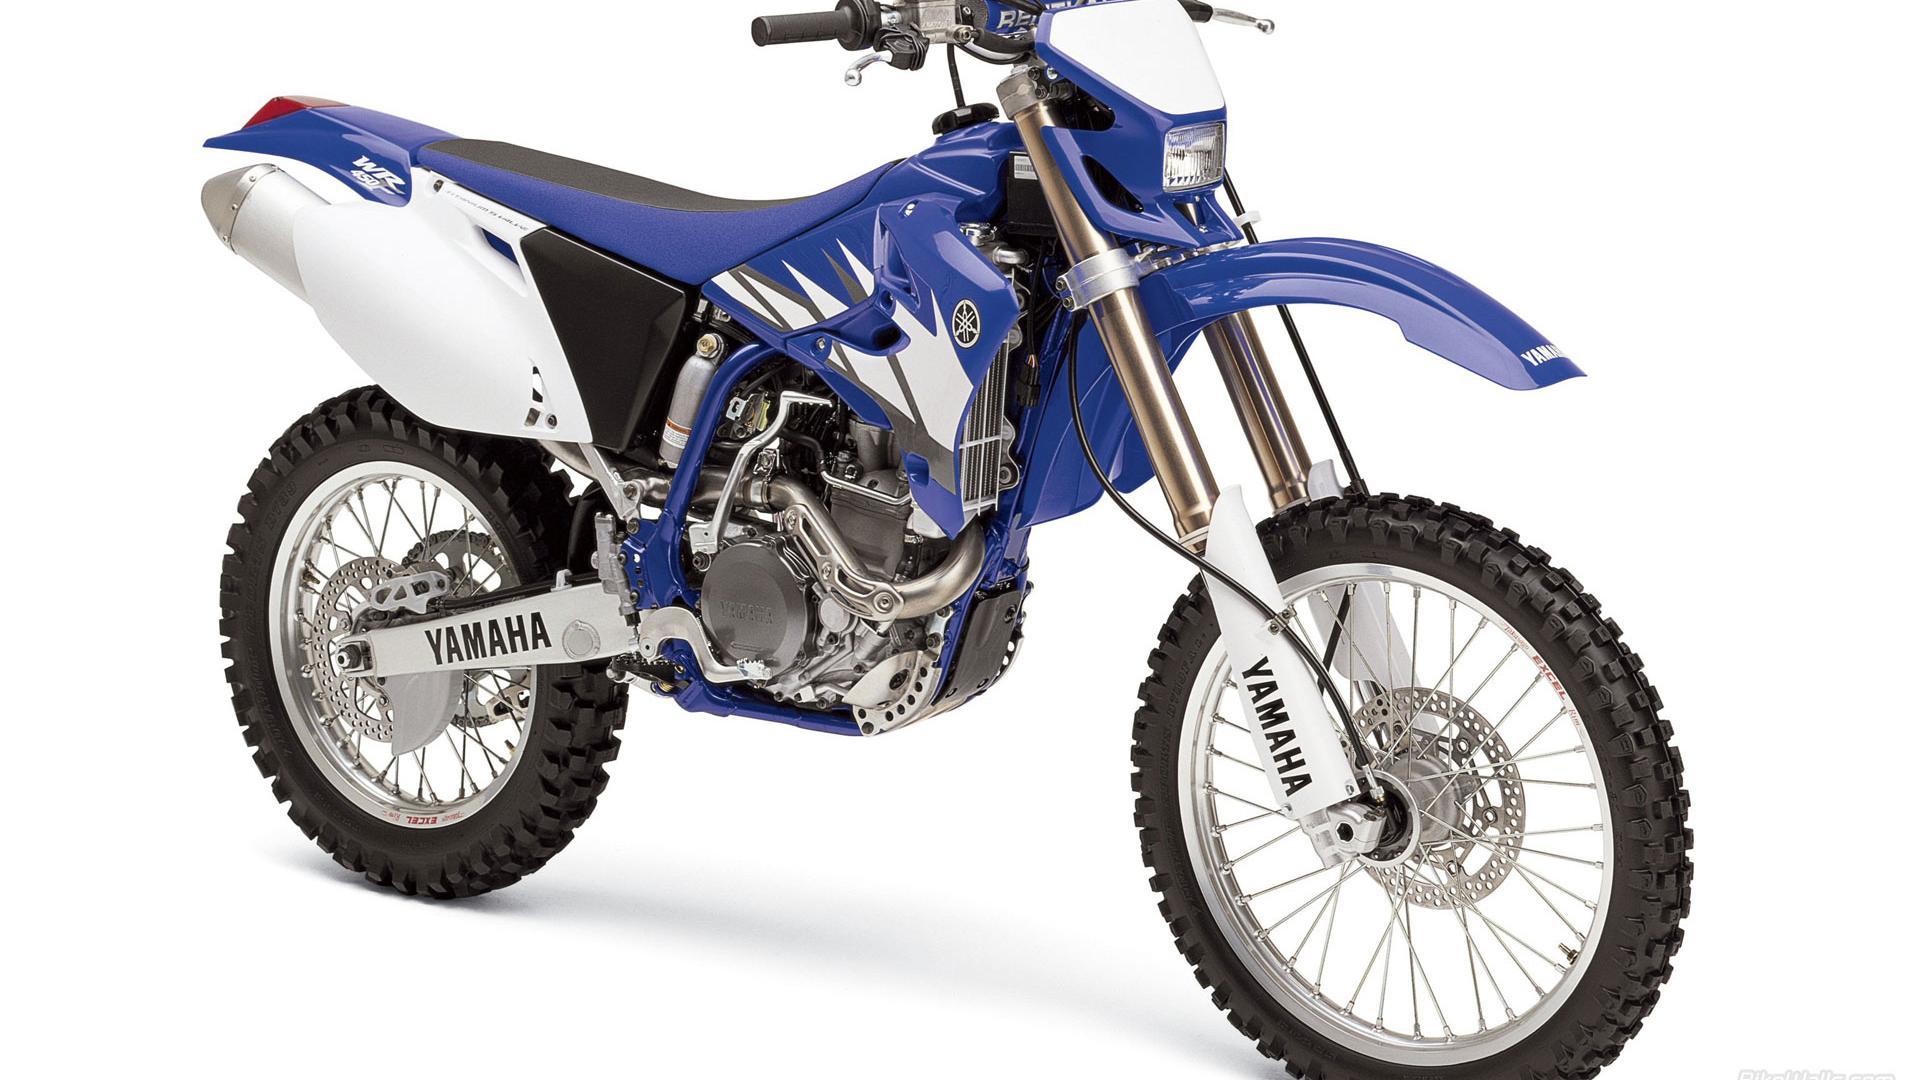 Yamaha, Off-Road, WR450F, WR450F 2003, мото, мотоциклы